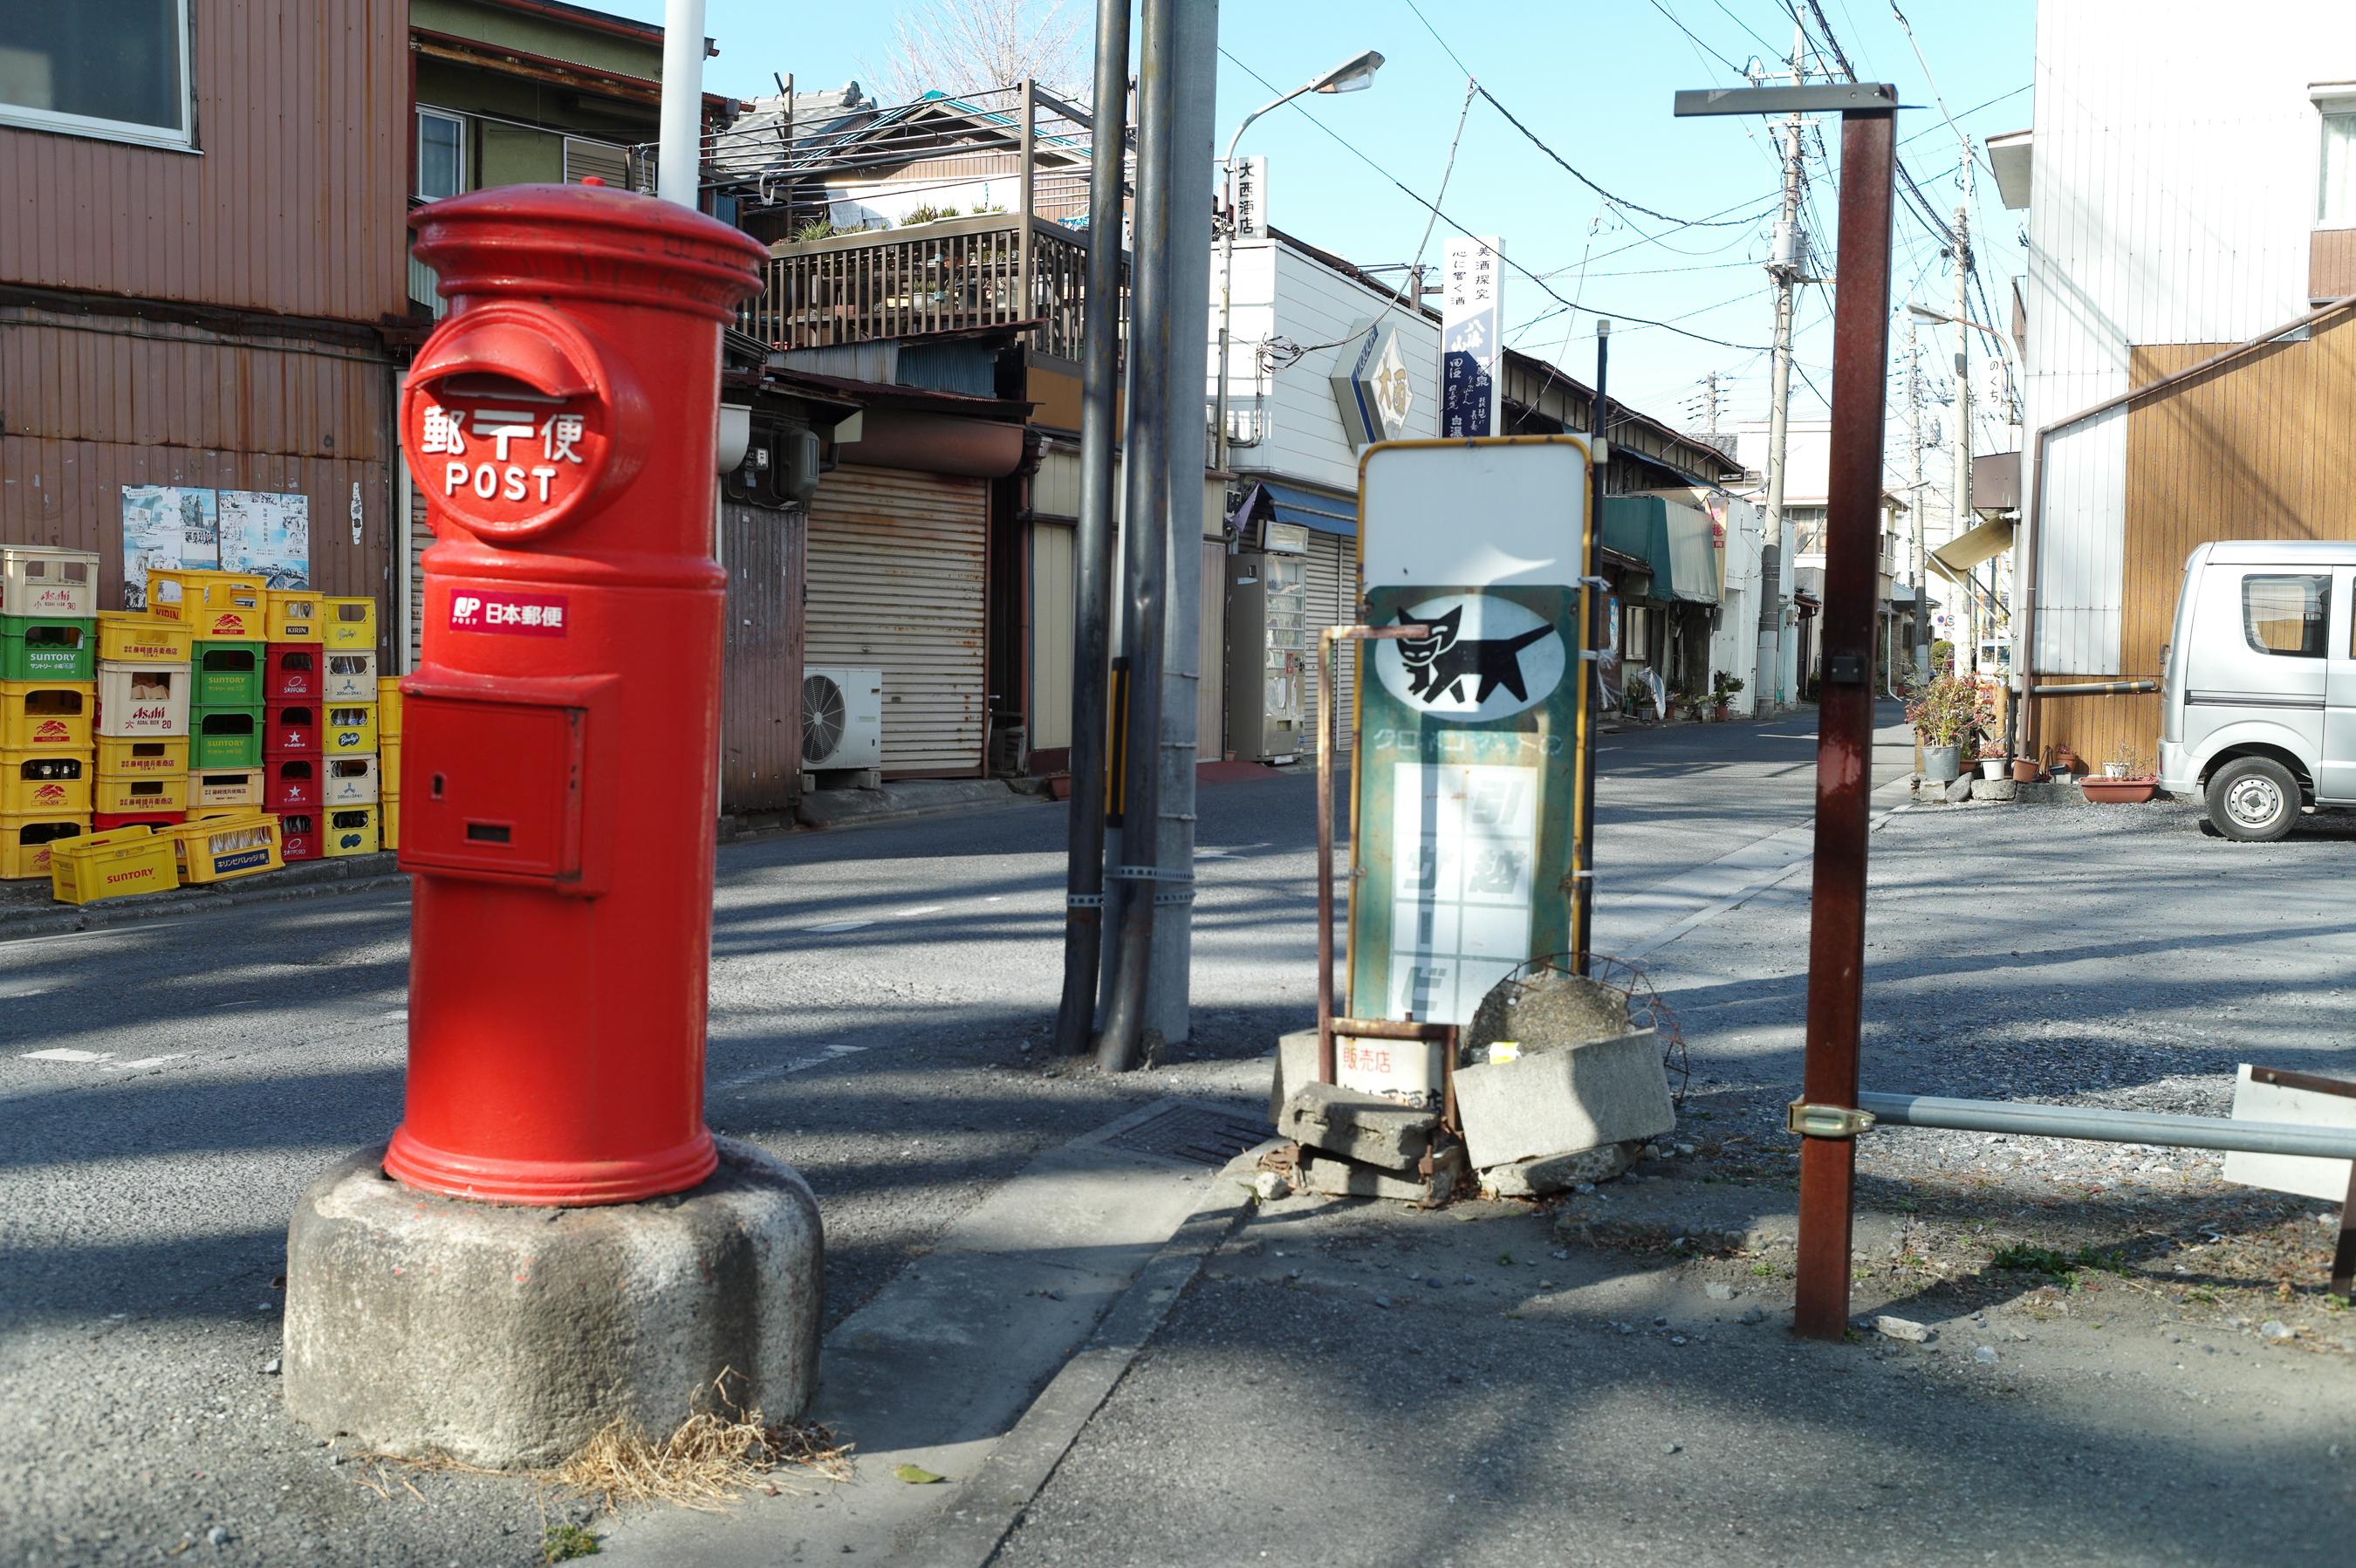 f:id:aoyama-takuro:20180211214021j:plain